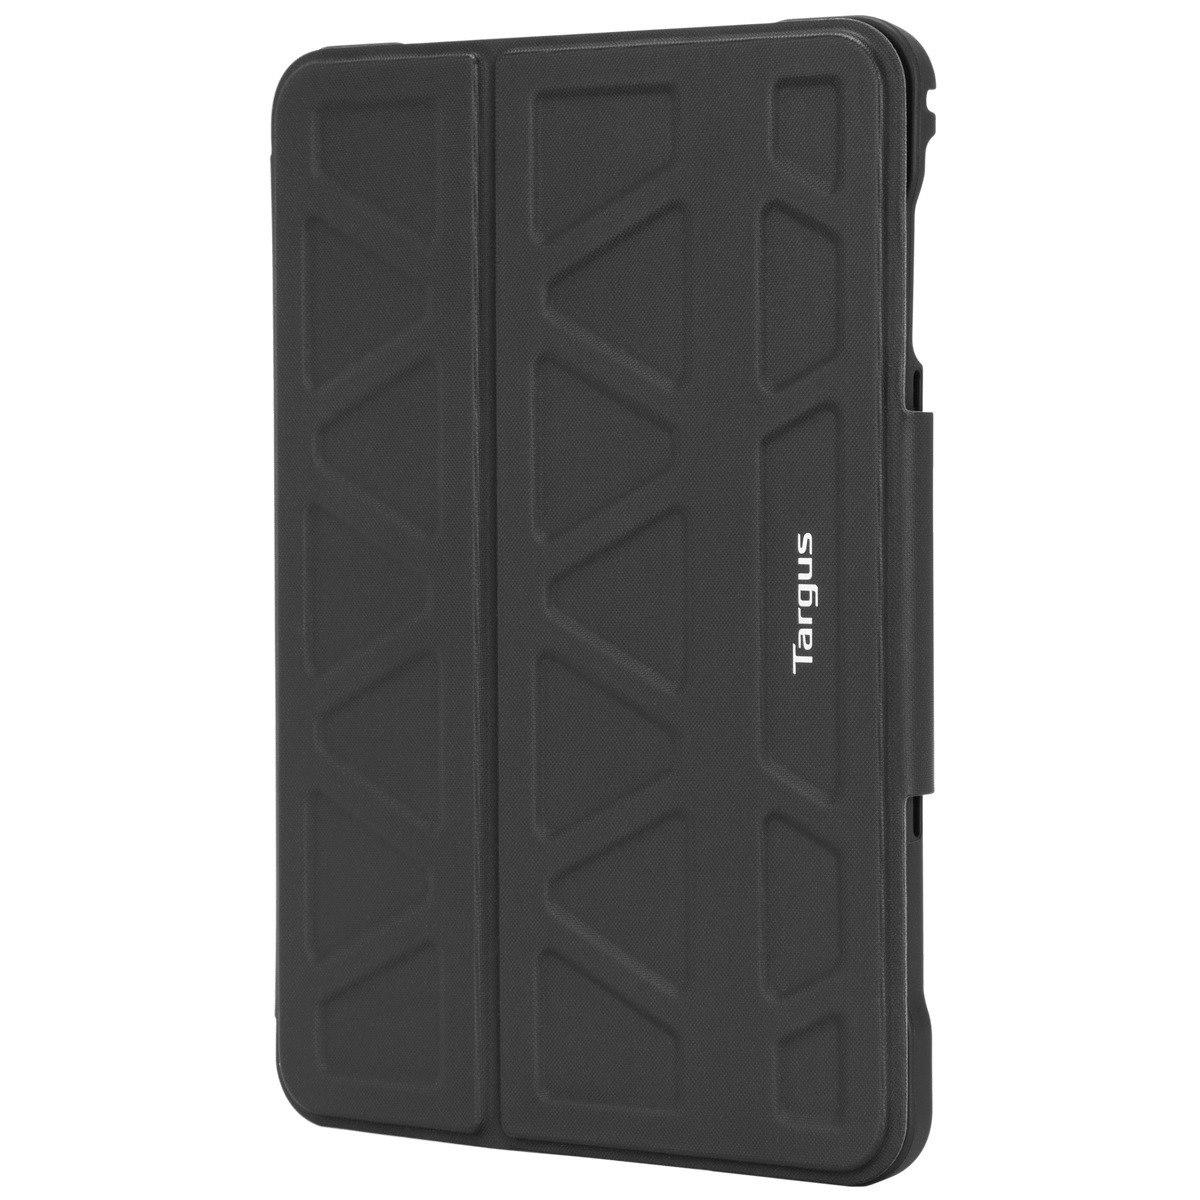 Targus Pro-Tek THZ695GL Carrying Case (Folio) for Apple iPad mini, iPad mini 2, iPad mini 3, iPad mini 4, iPad mini (5th Generation) - Black